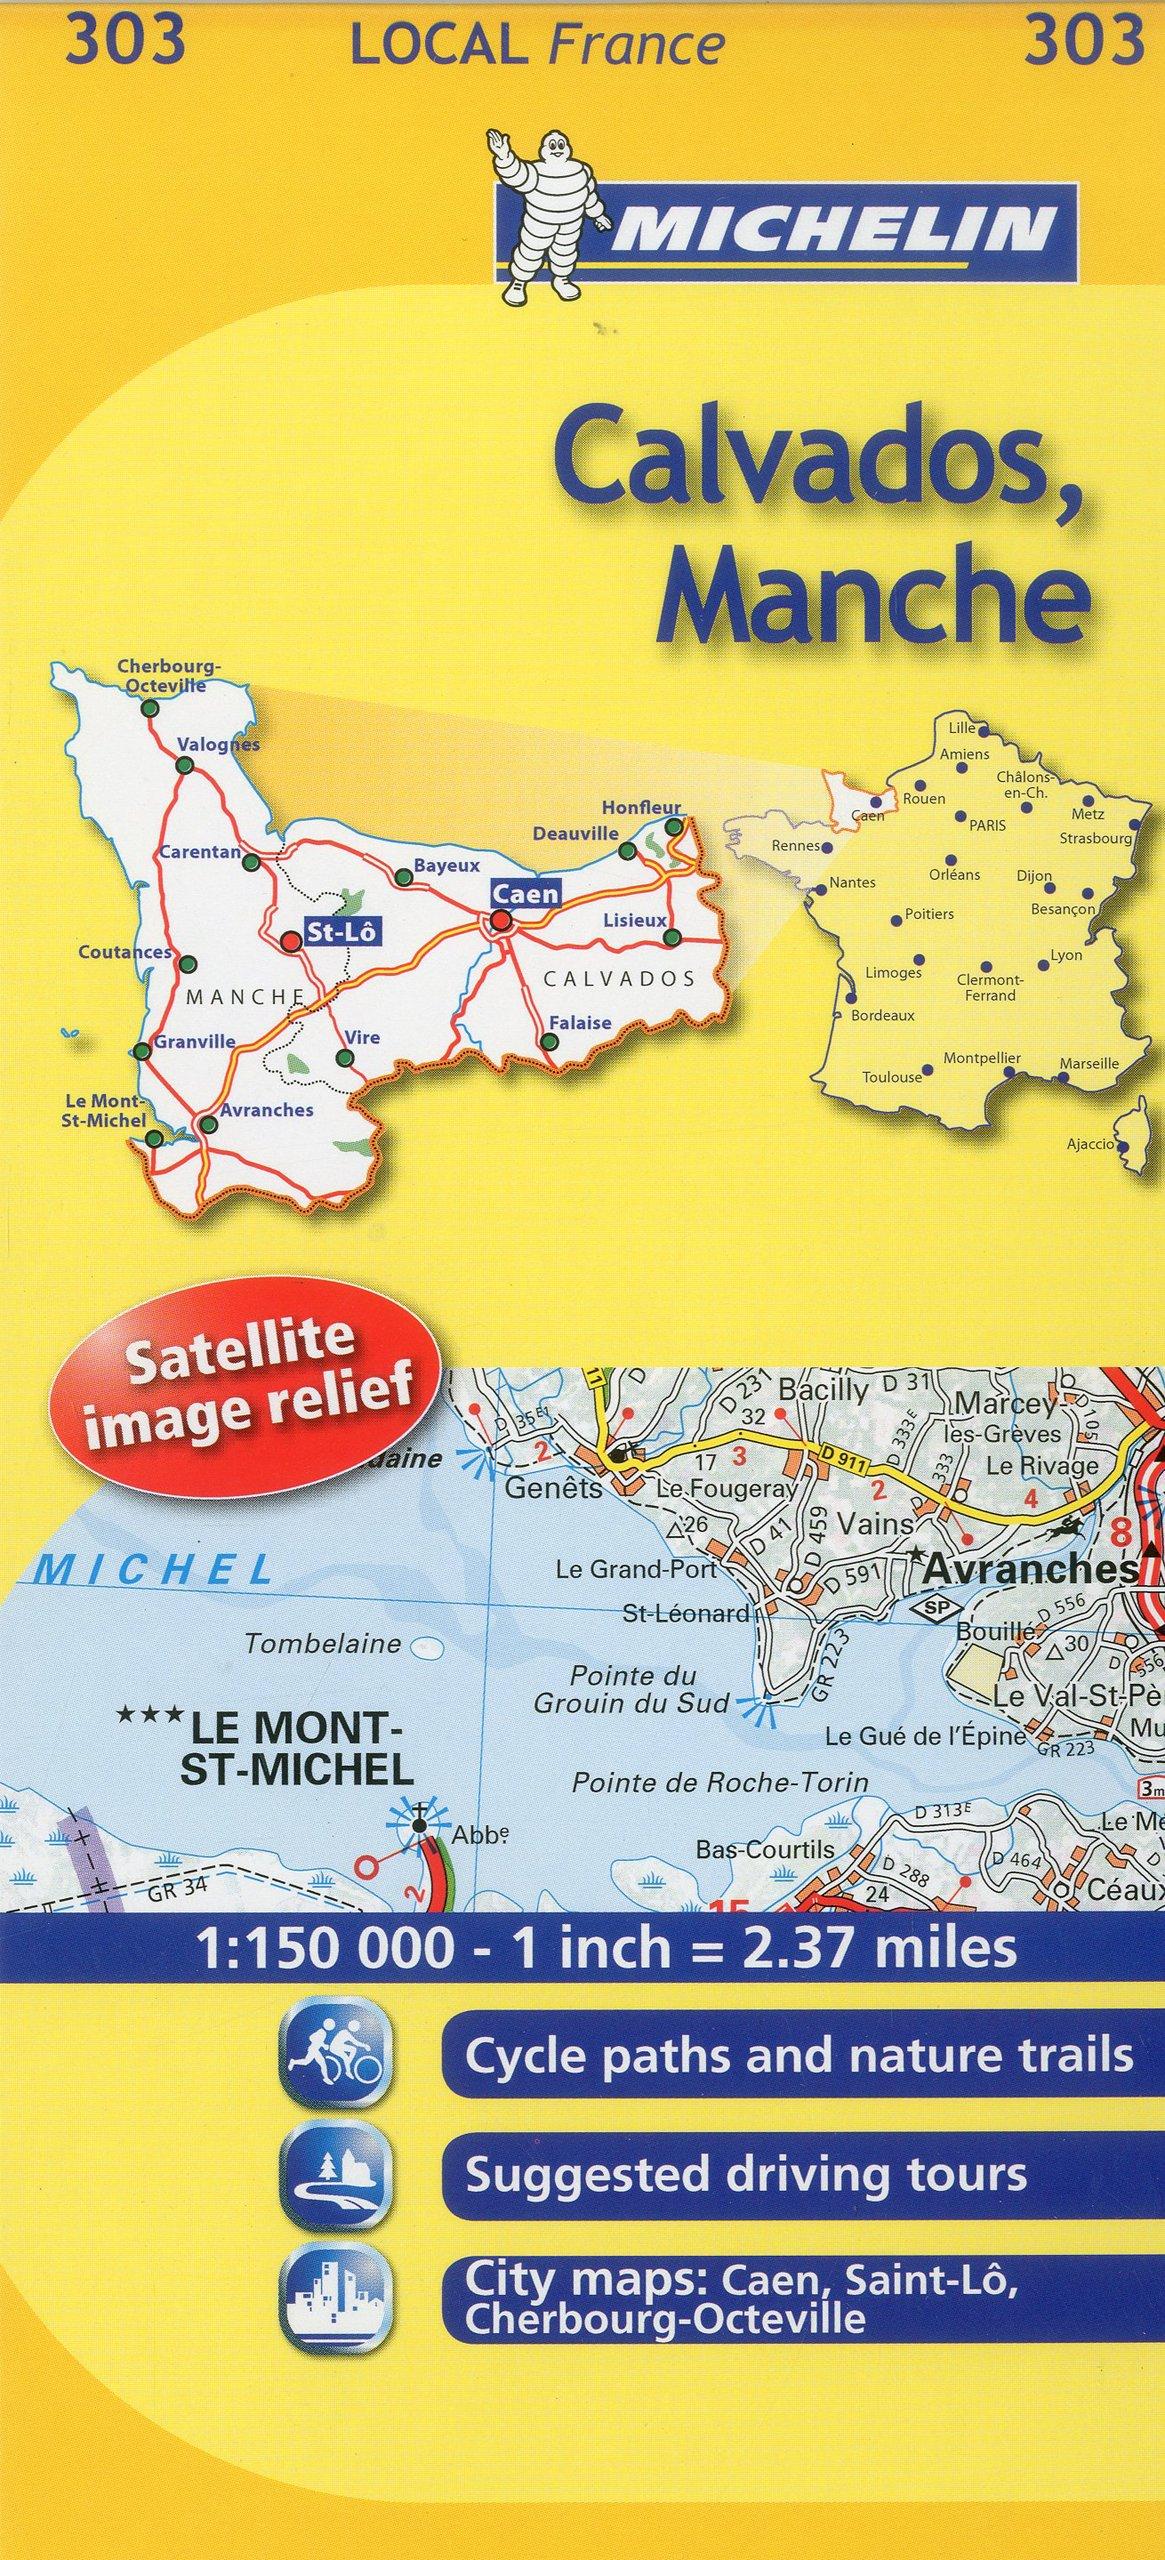 Calvados France Map.Michelin Map France Calvados Manche 303 Maps Local Michelin